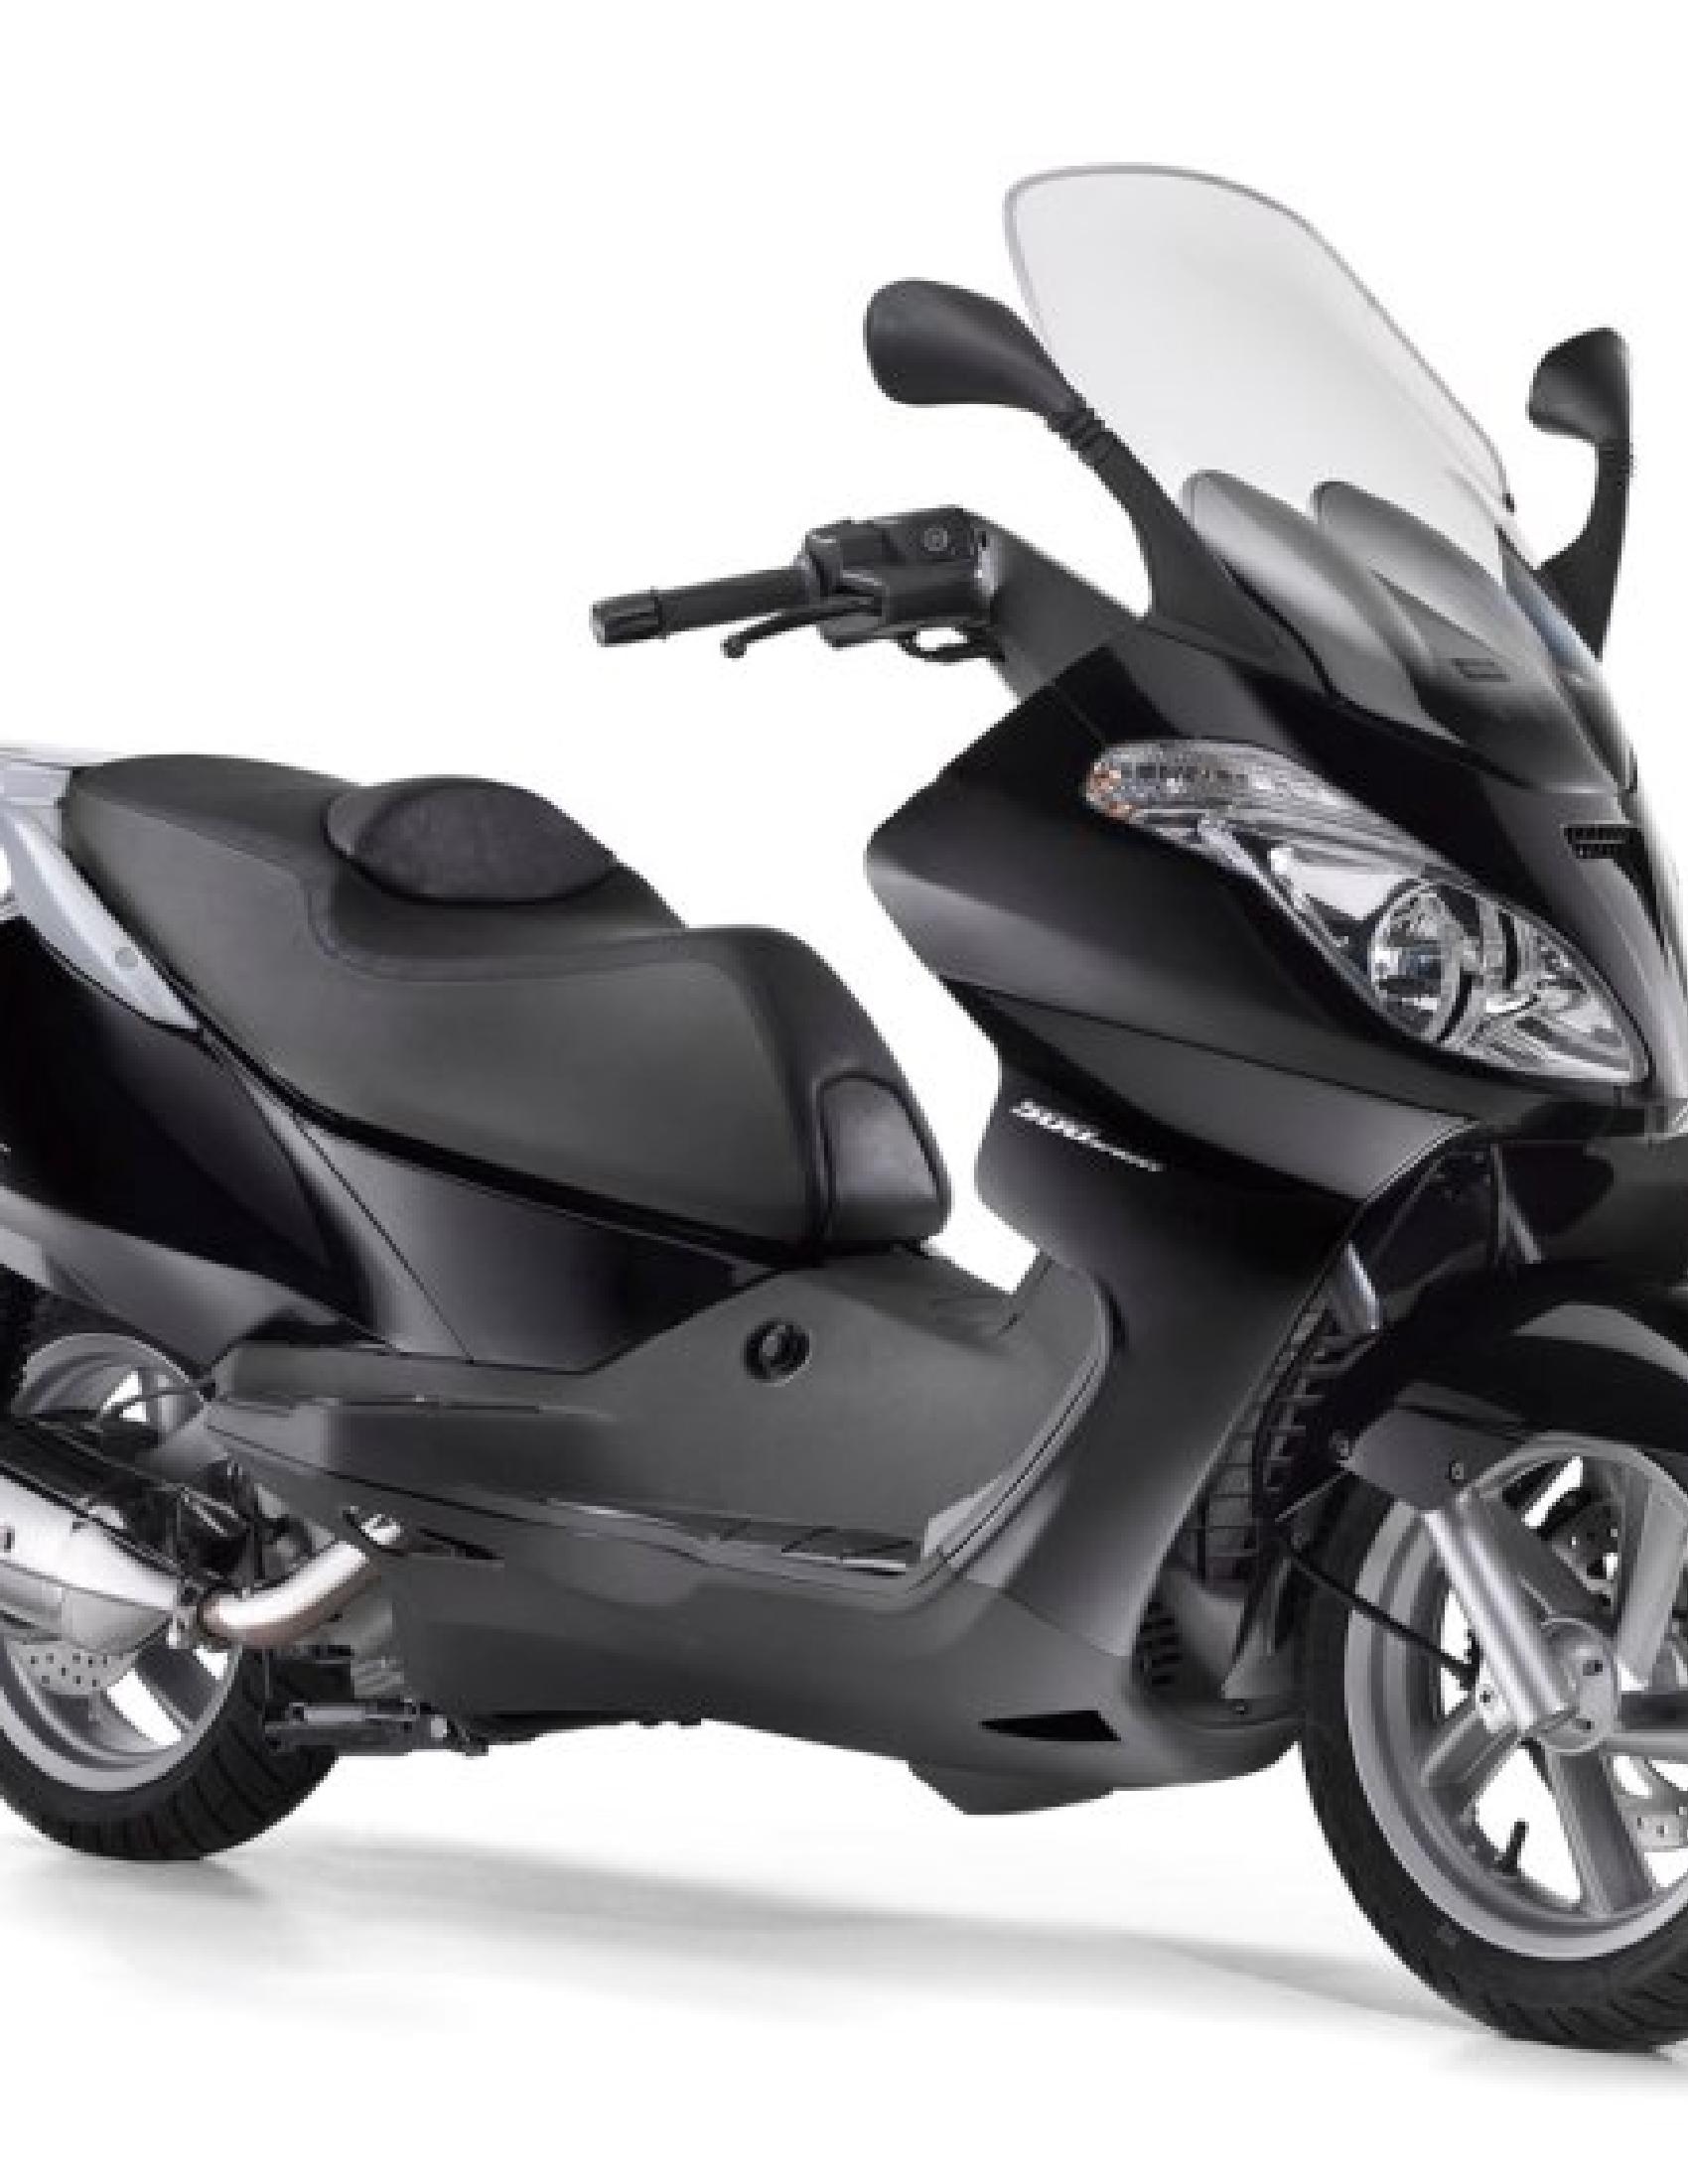 Aprilia 125 ATLANTIC Motorcycle manual